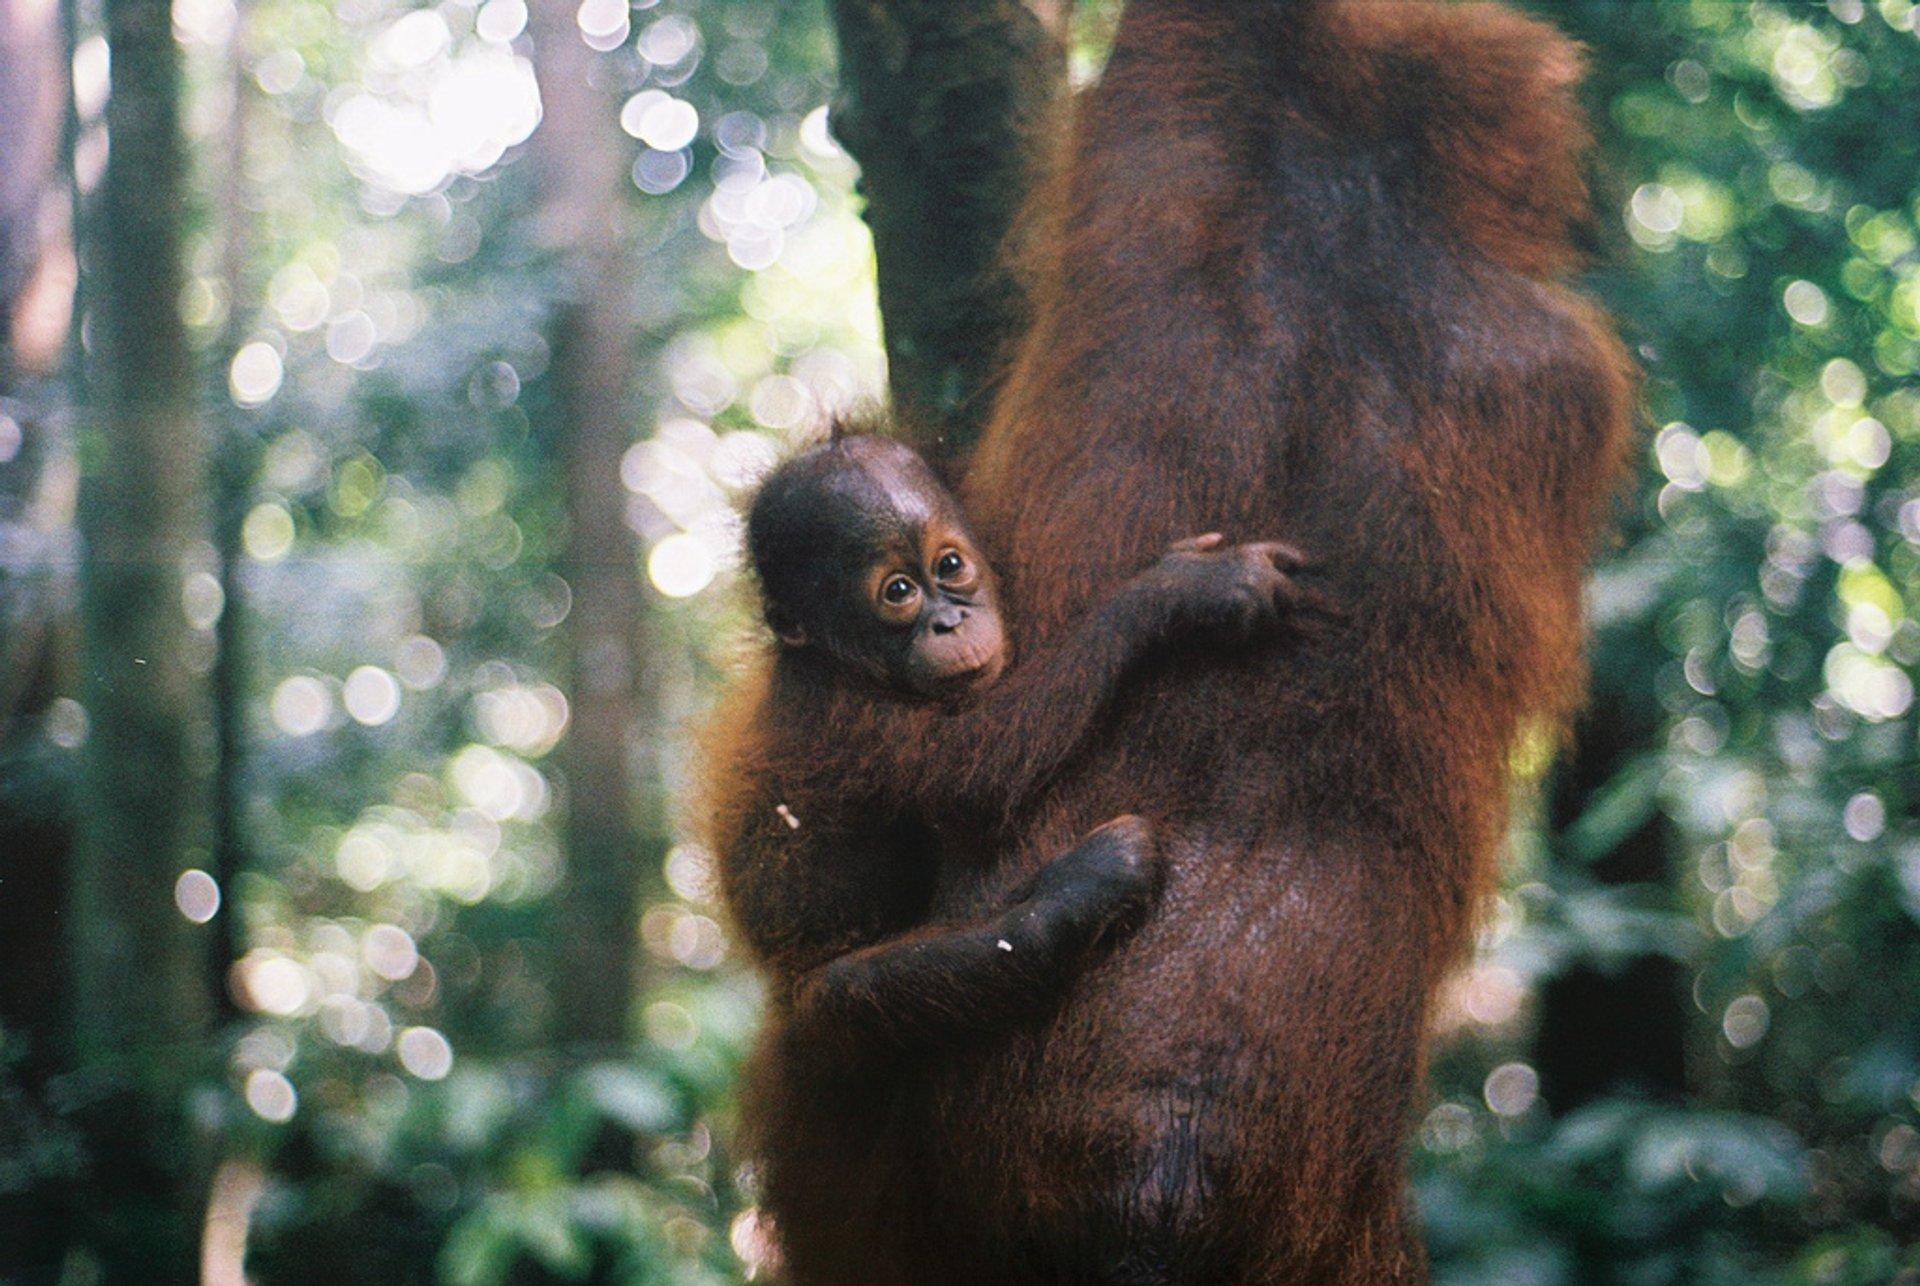 Watching Orangutans in Malaysia - Best Season 2019